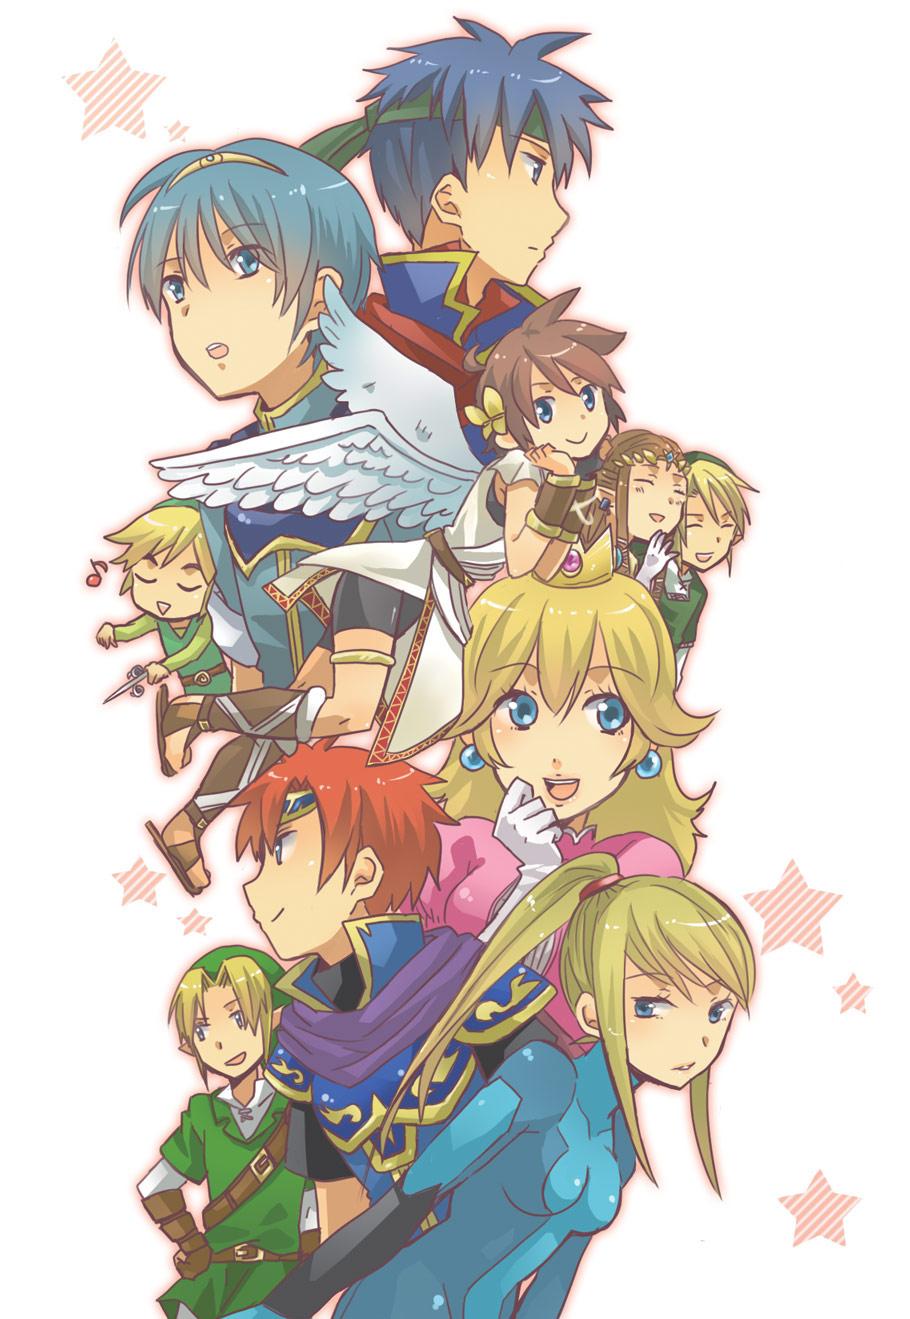 Anime Characters For Smash : Super smash bros mobile wallpaper  zerochan